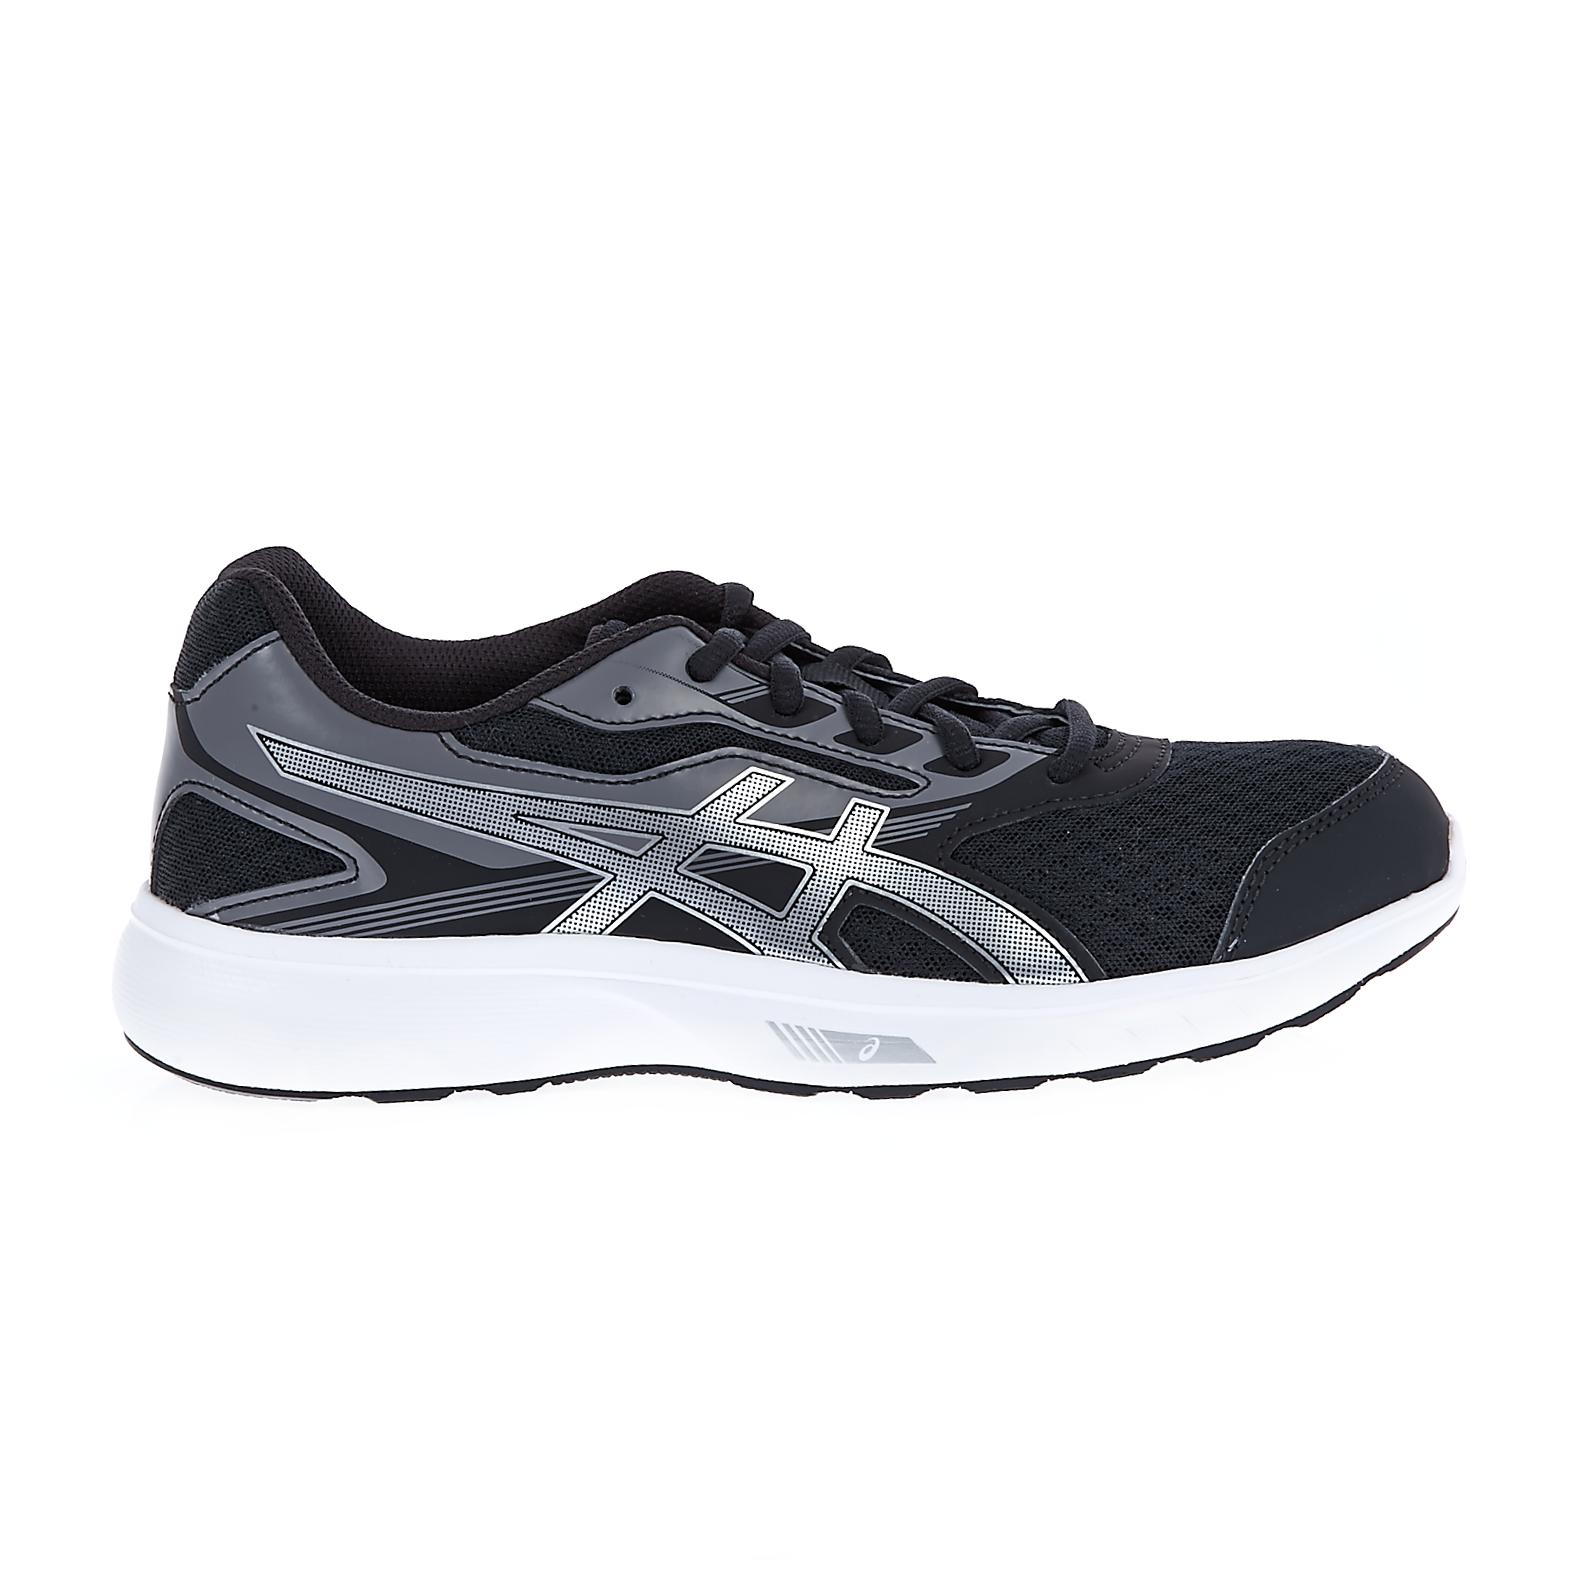 ASICS – Παιδικά αθλητικά παπούτσια ASICS STORMER GS μαύρα